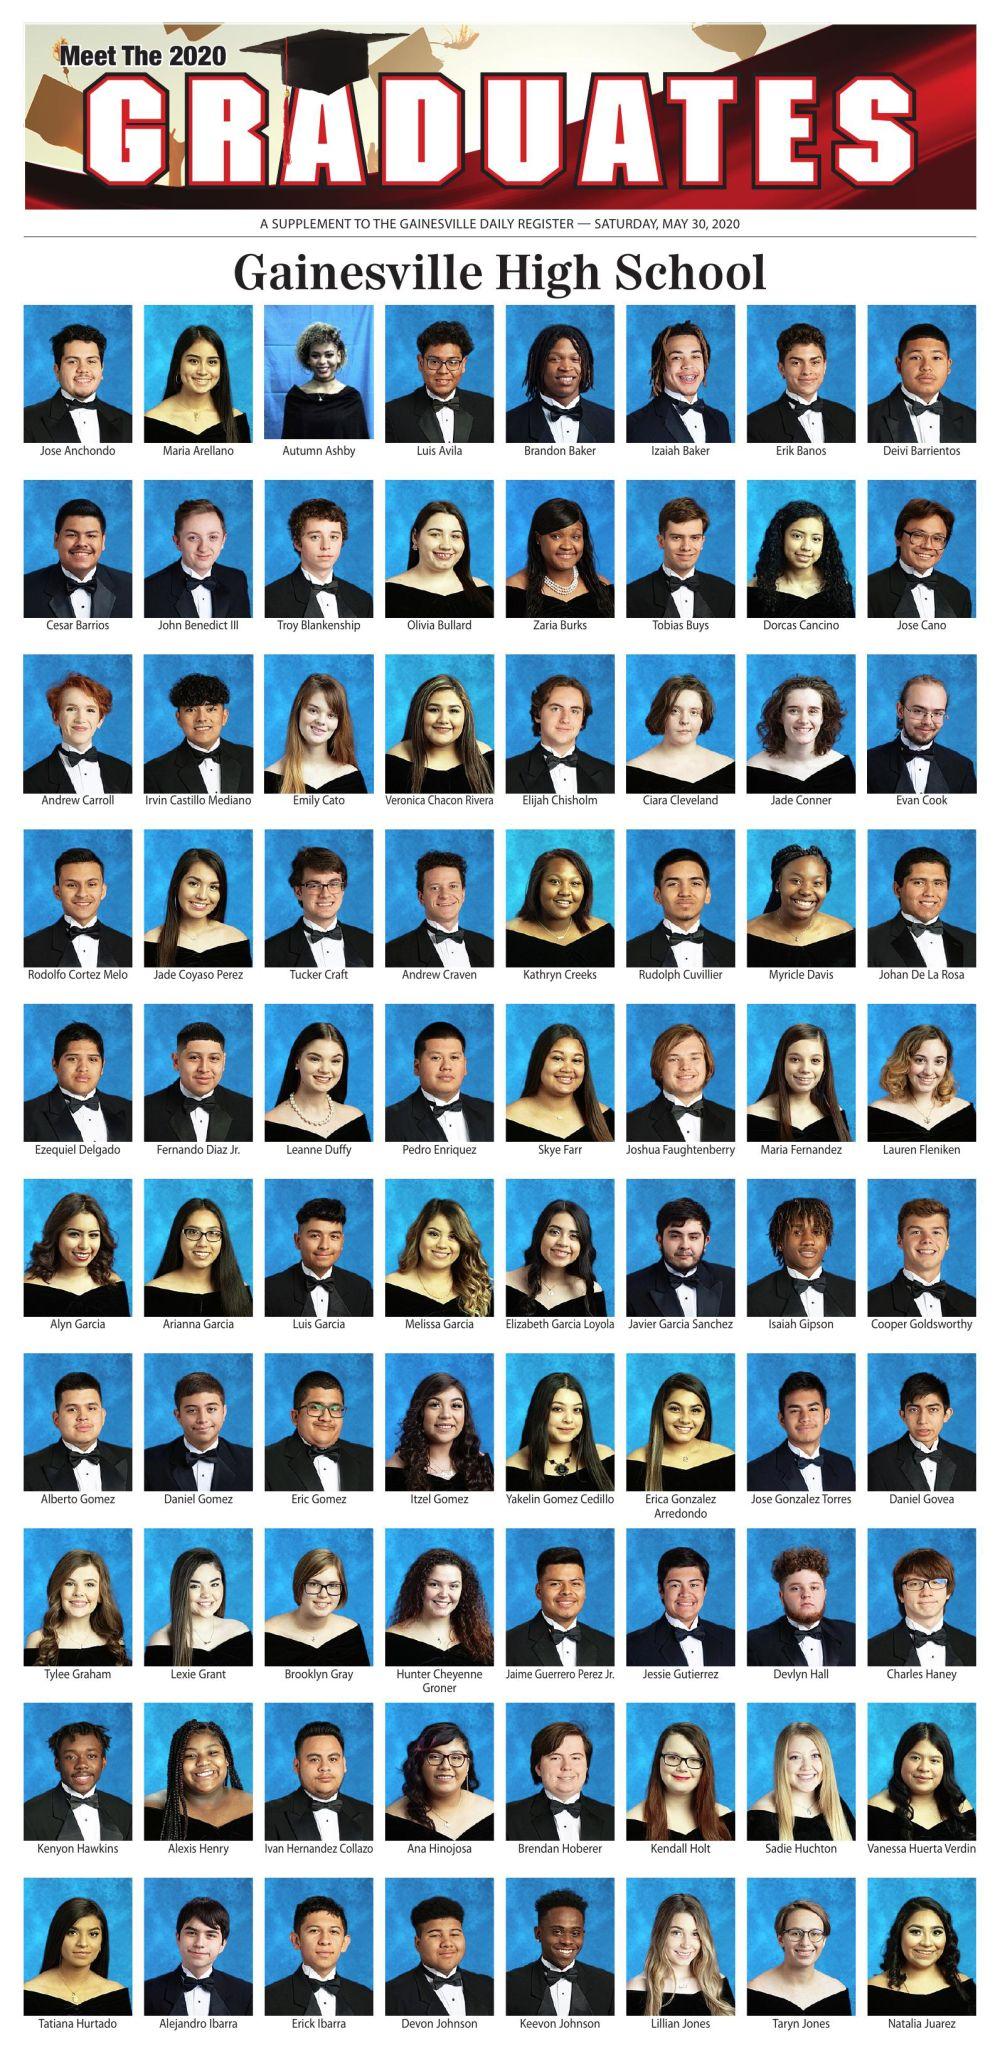 PDF: Meet the Graduates 2020